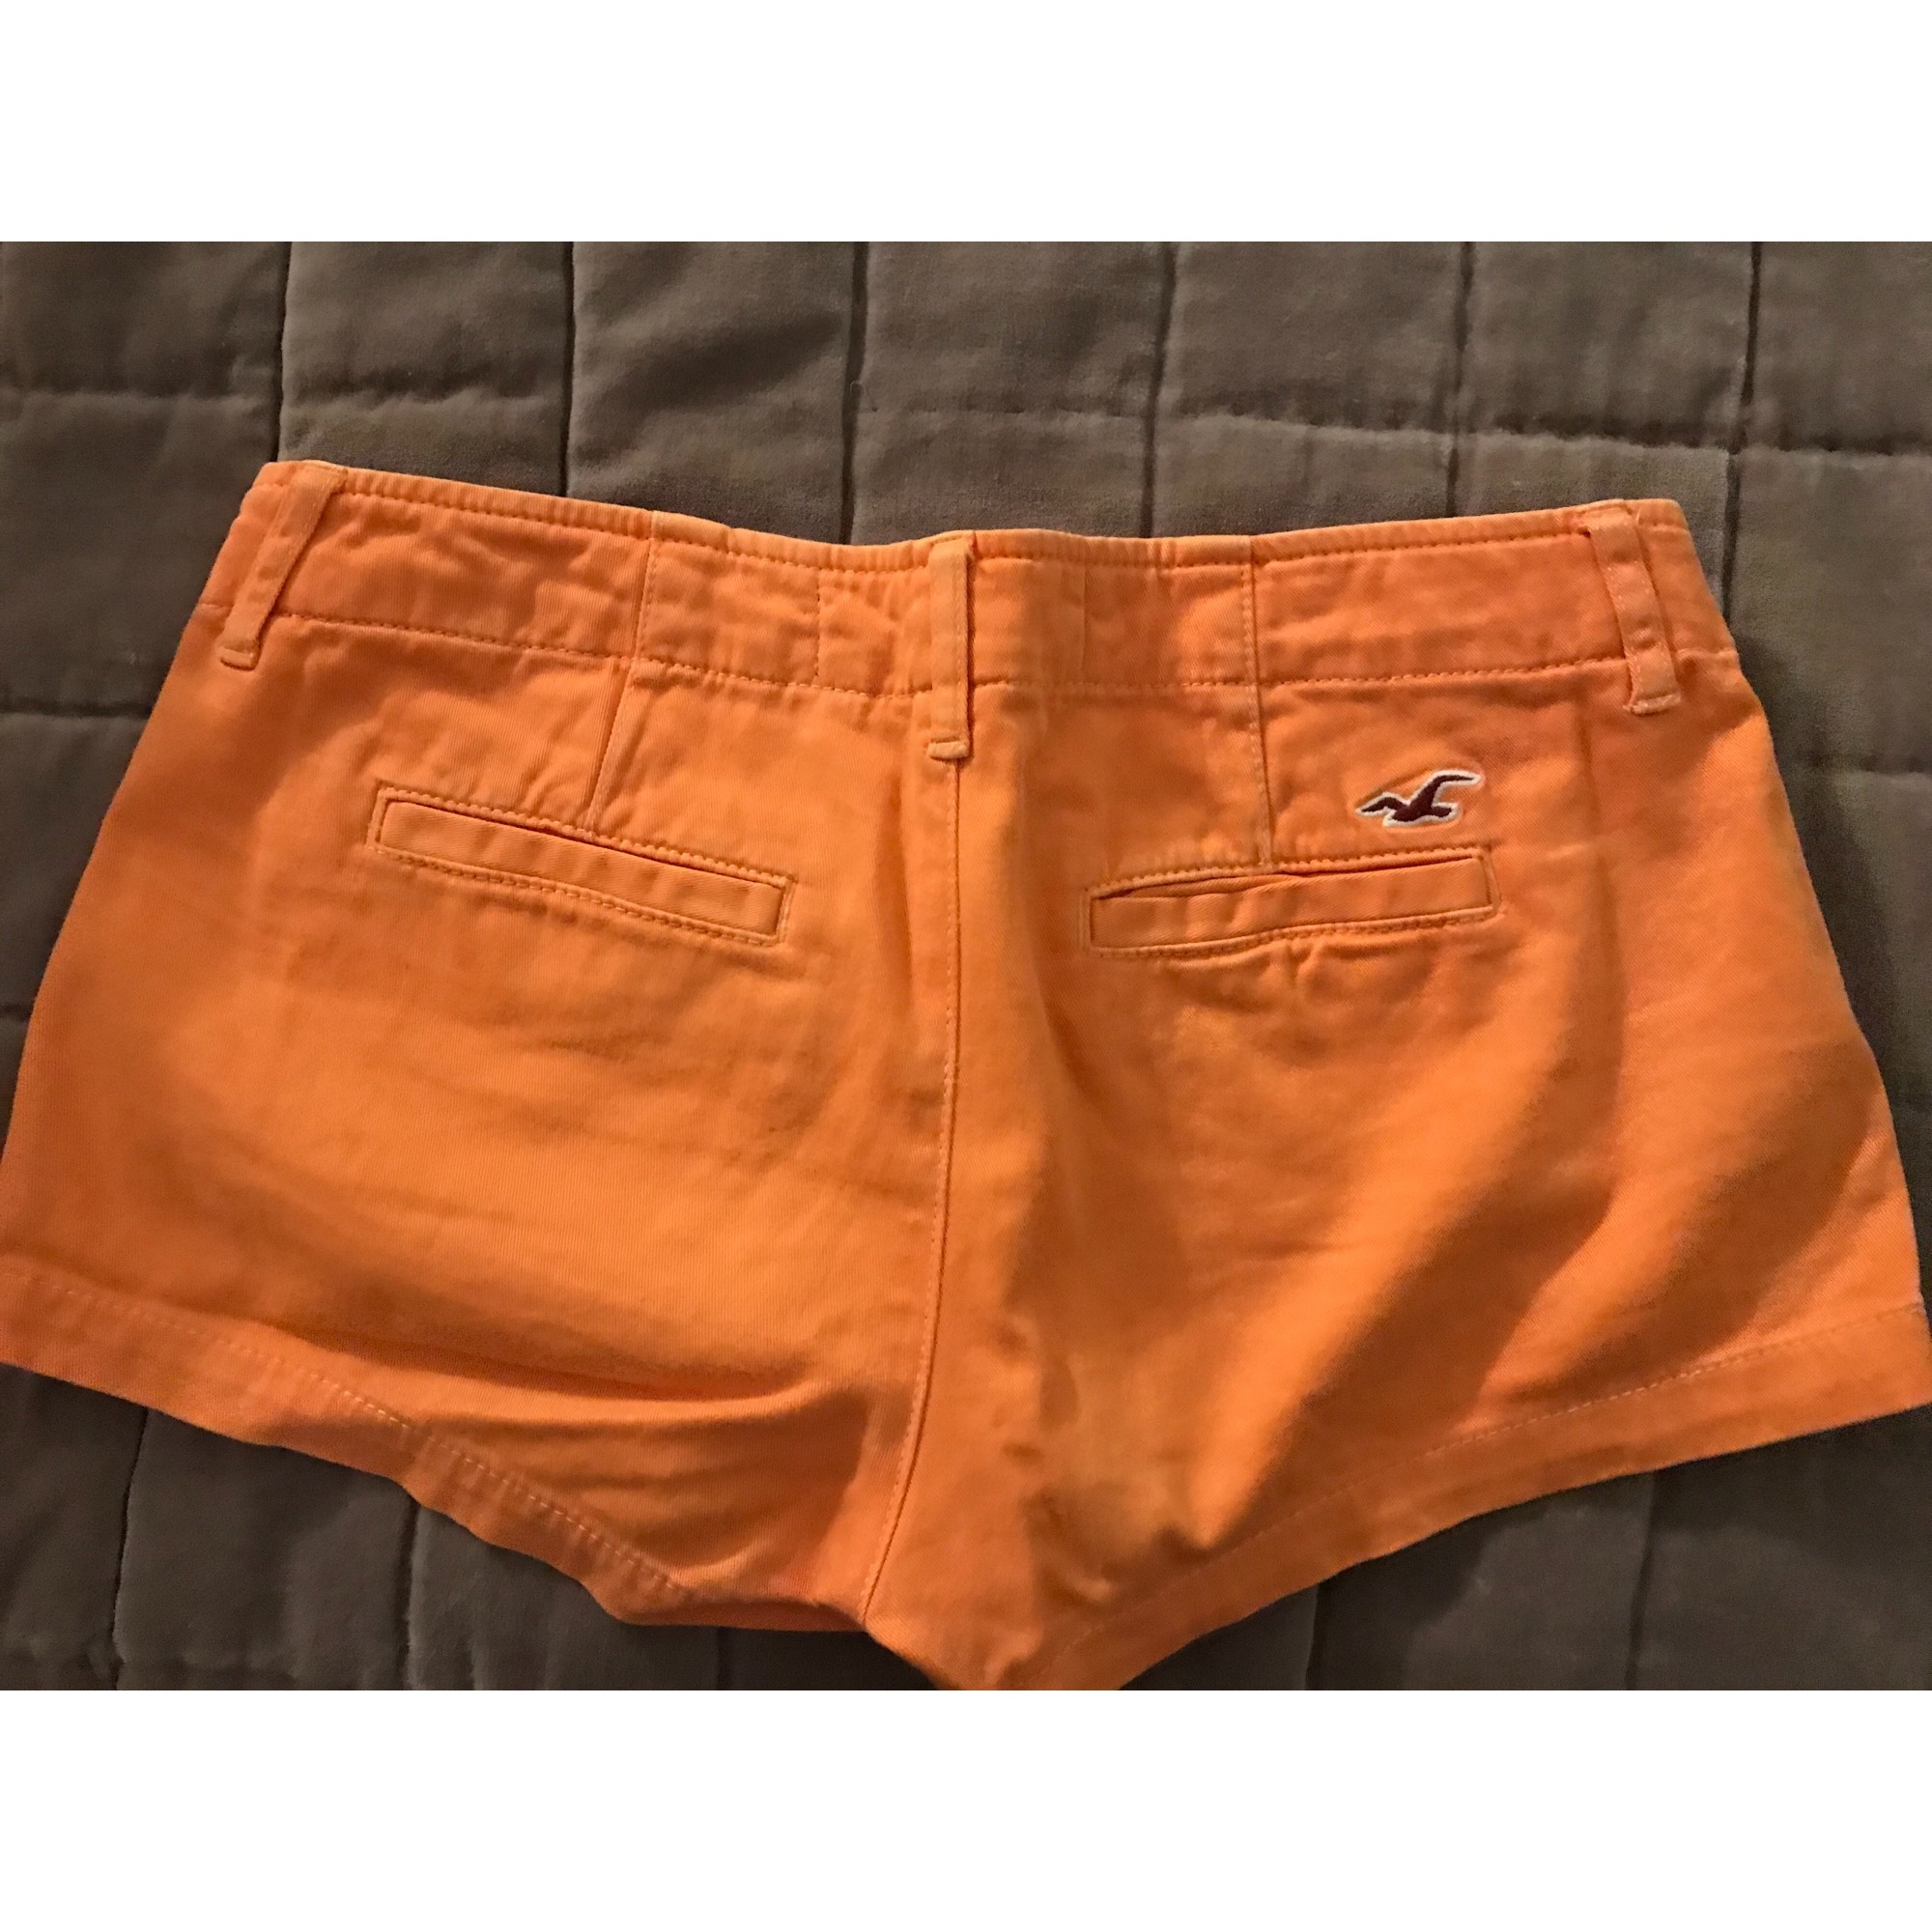 Short HOLLISTER Orange